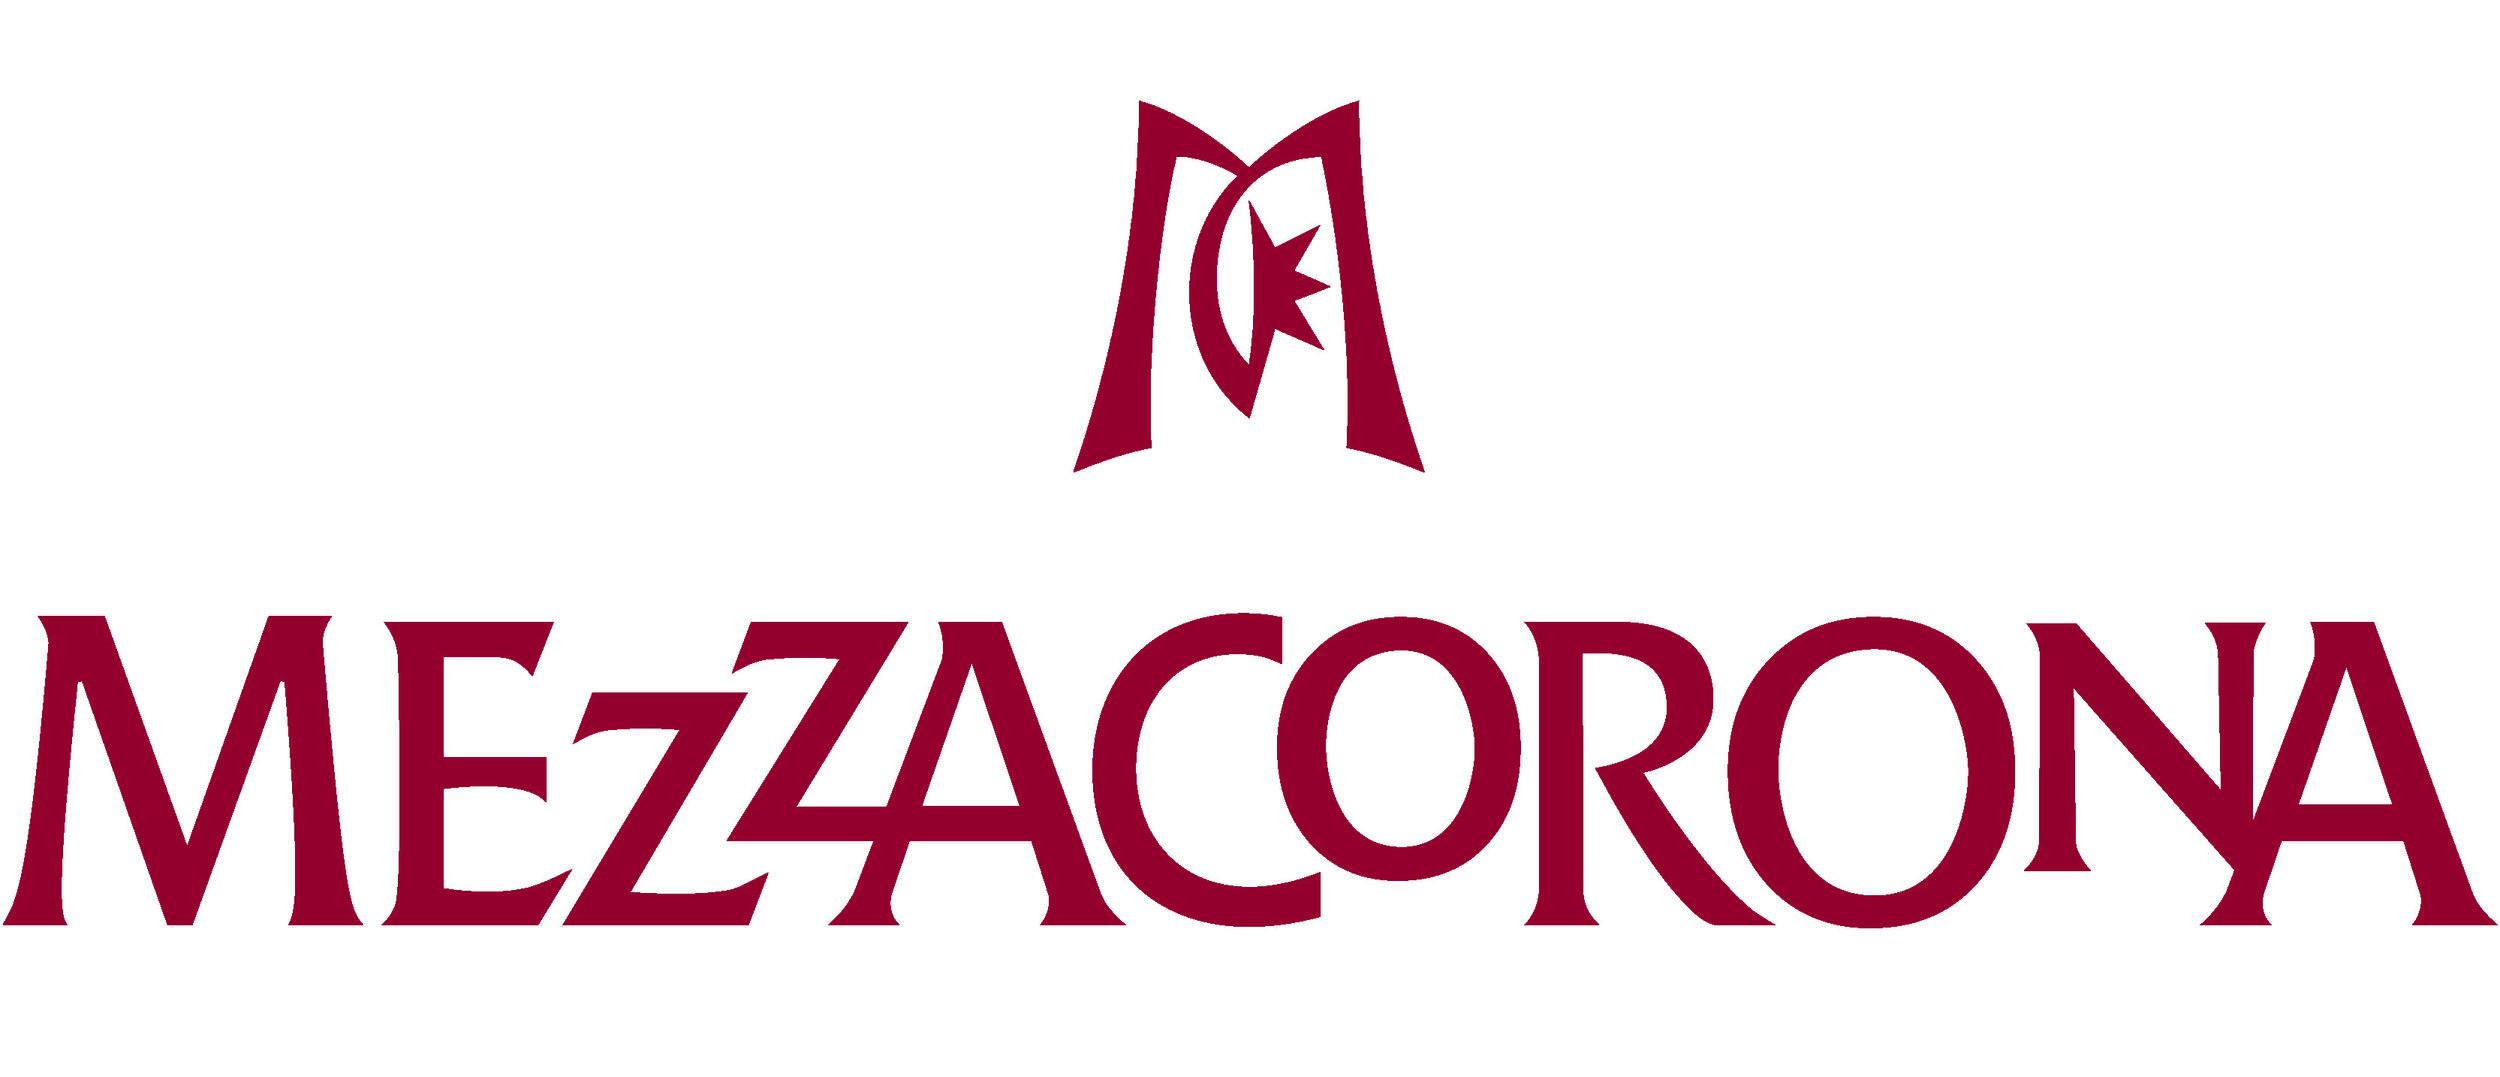 Mezzacorona Logo.jpg